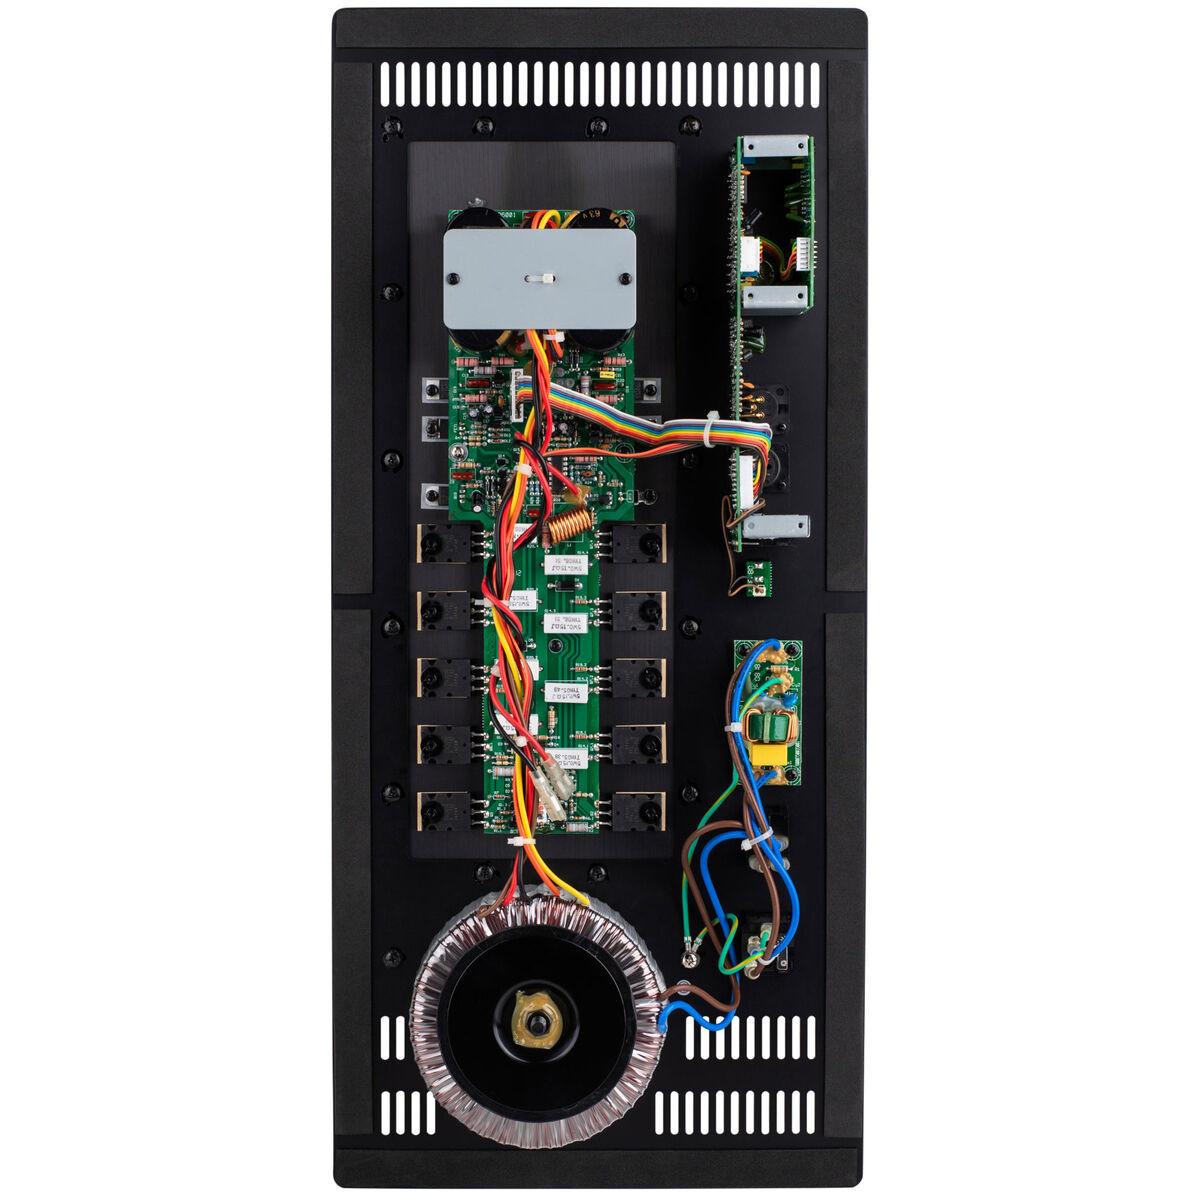 B-52 ACT-1515X-230V 1000 Watt Full-Range Plate Amplifier - 230V